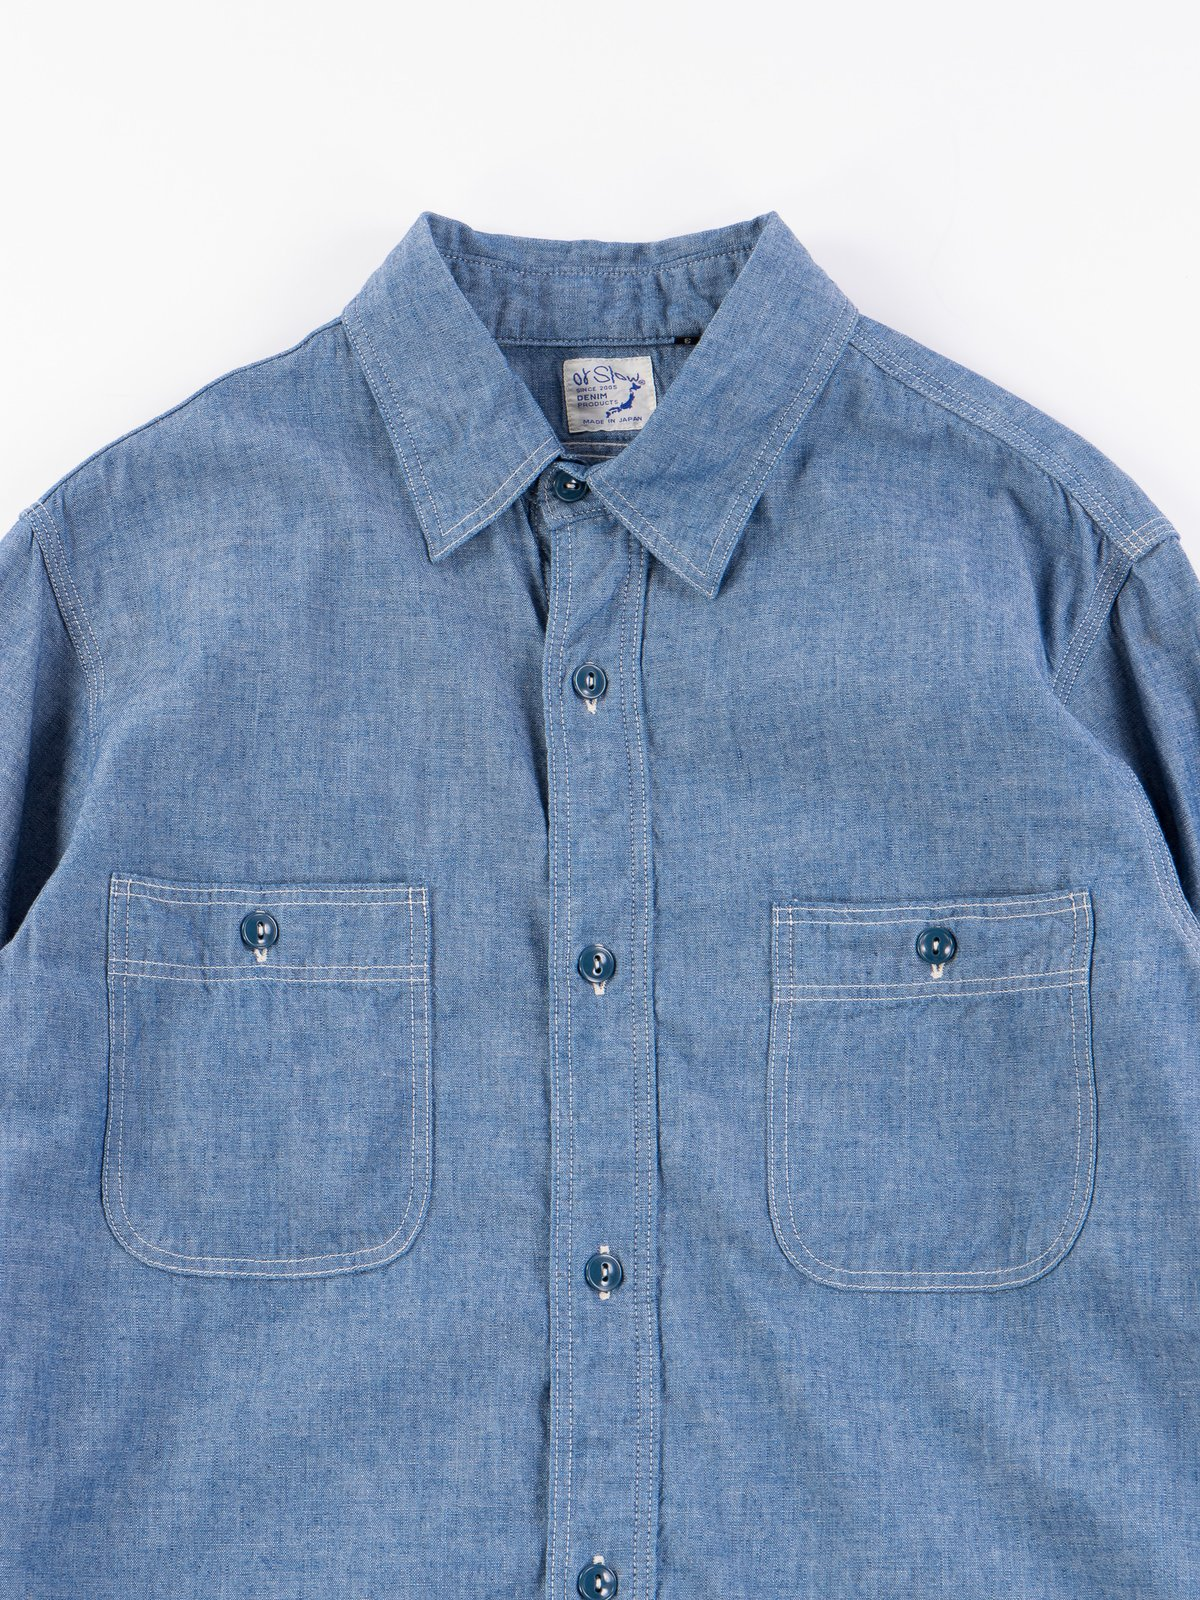 Blue Chambray Work Shirt - Image 3